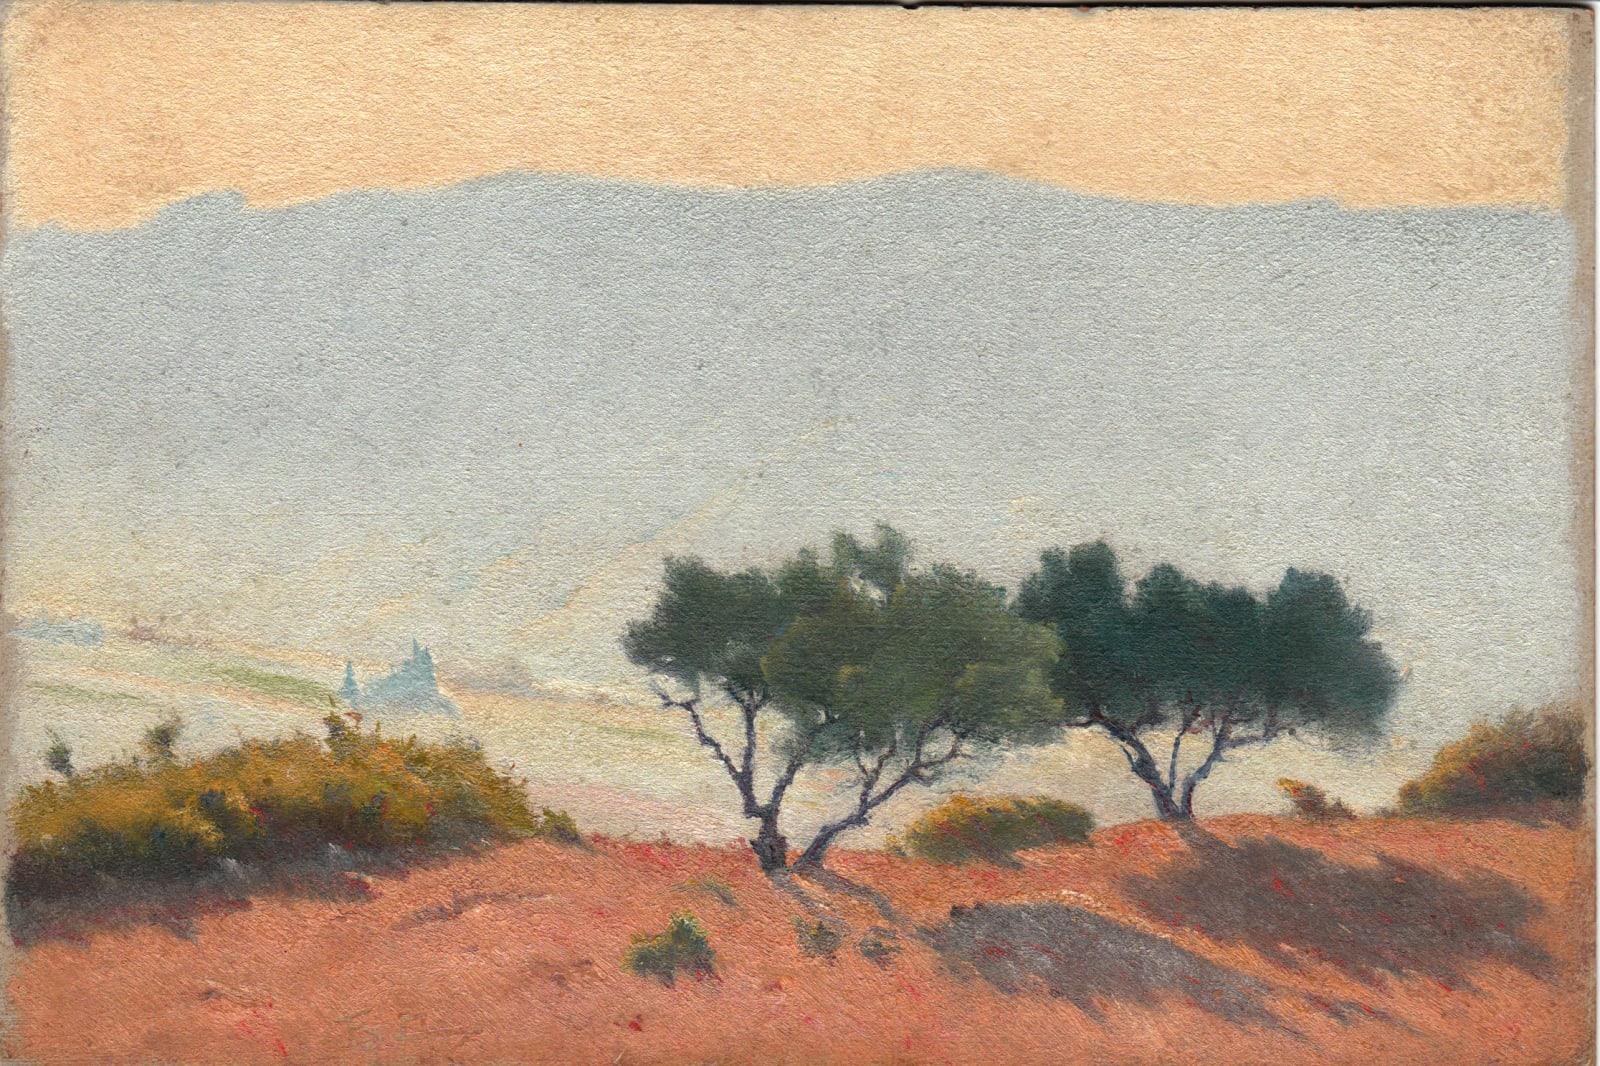 EDOUARD ATHÉNOSY, M-53, c. 1911